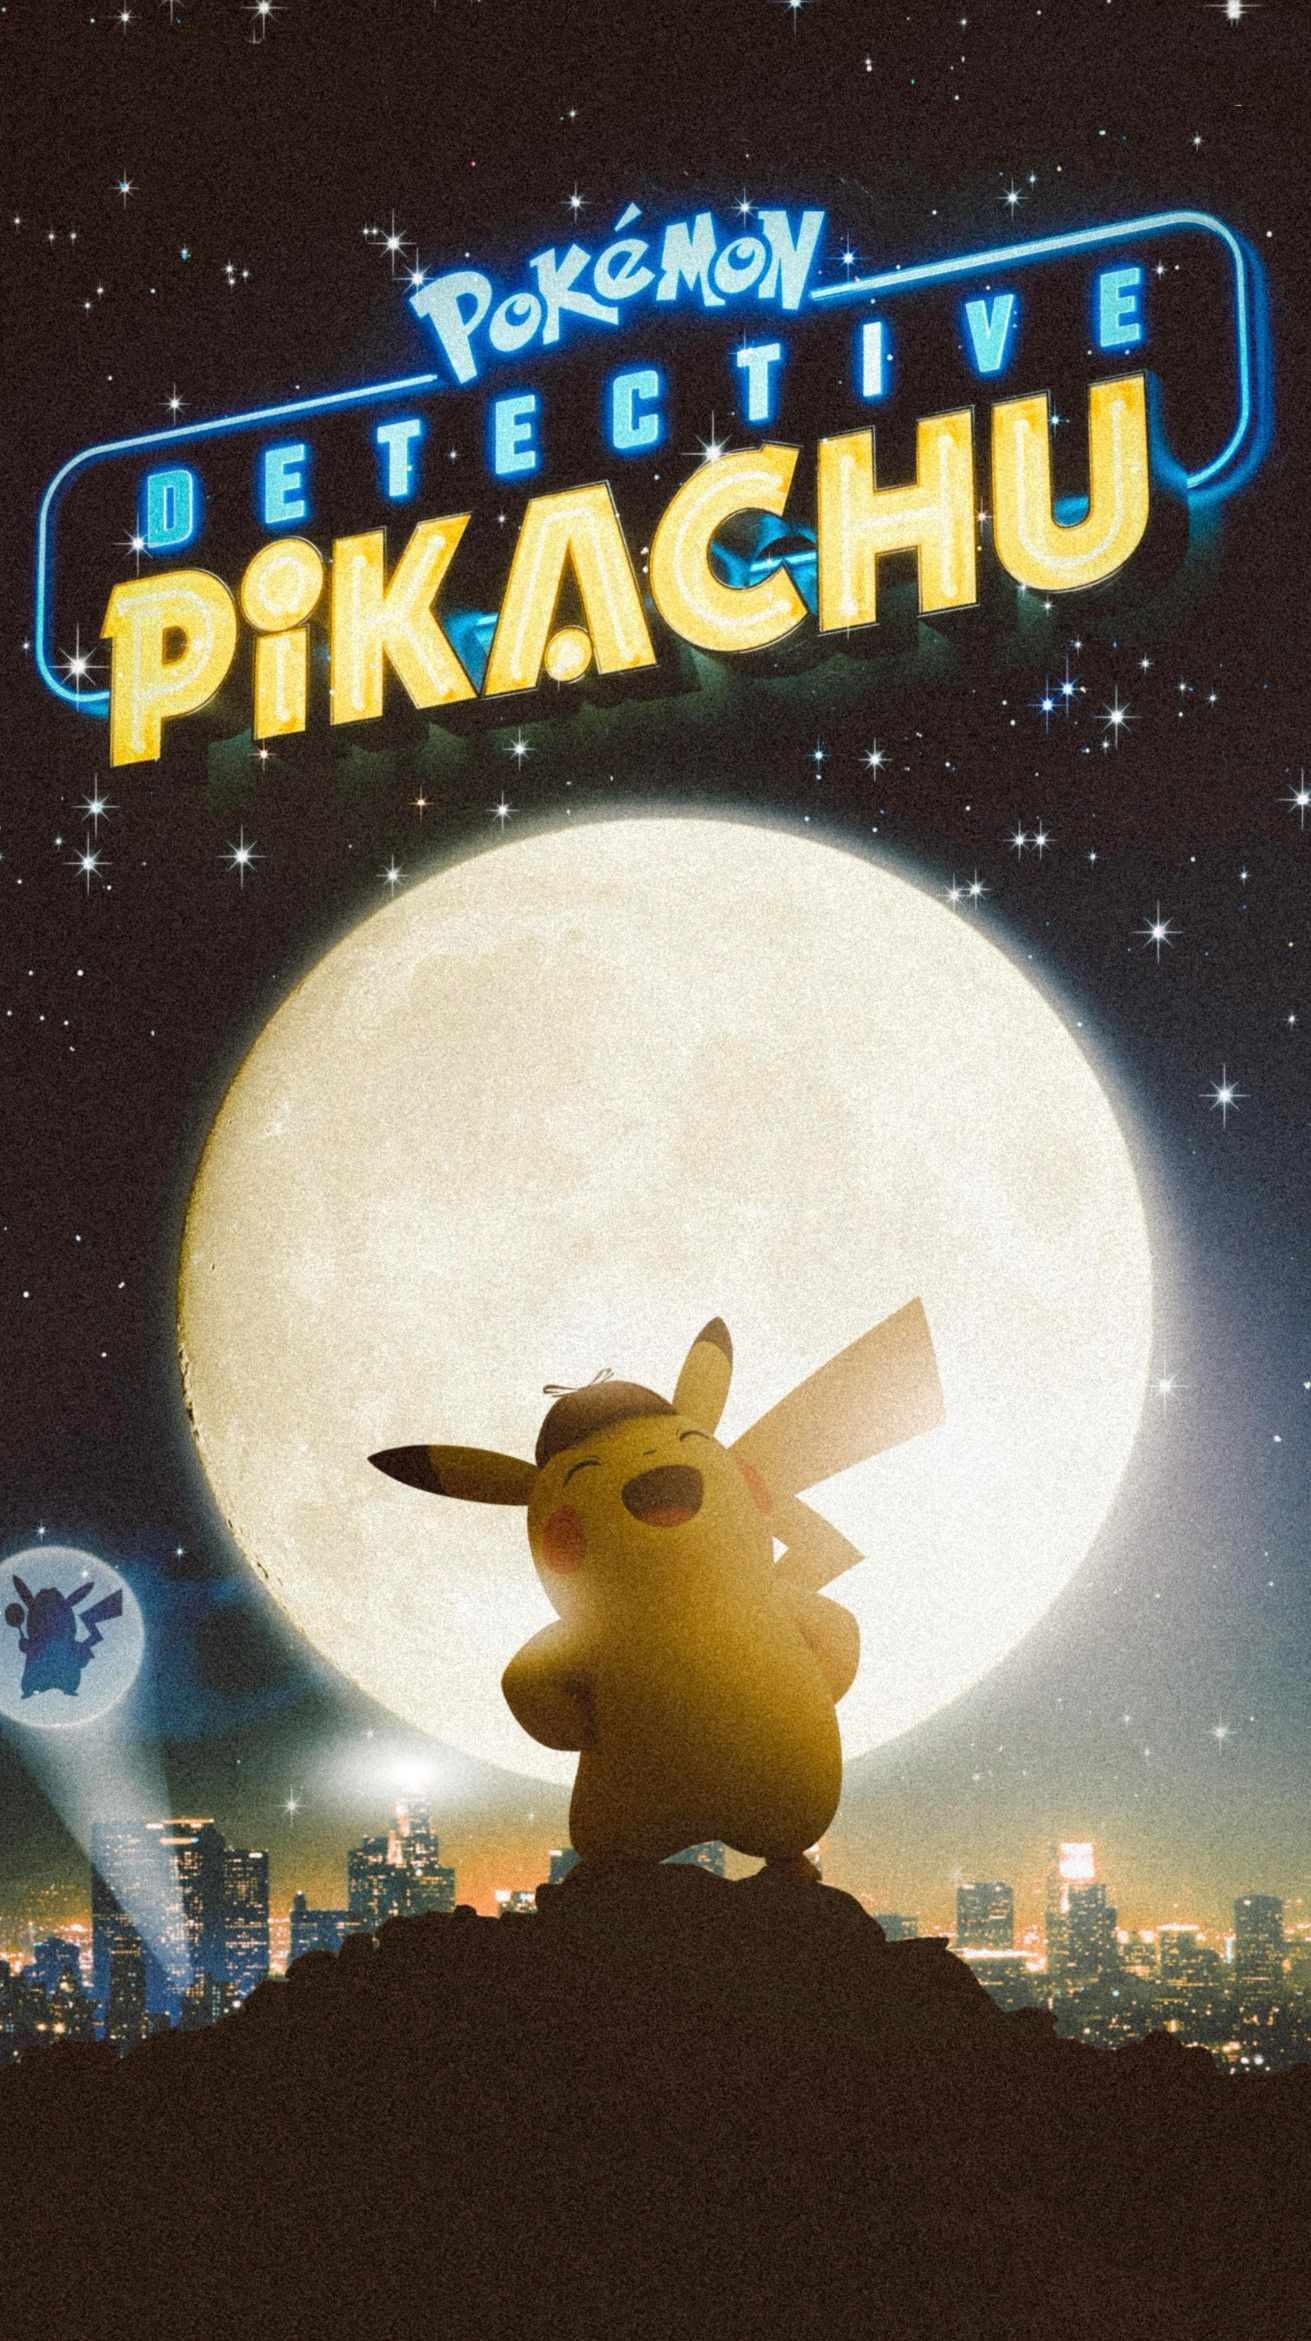 Pin De Luisina Ravarotto Em Dectetive Pikachu Presentes Pokemon Pokemon E Pikachu